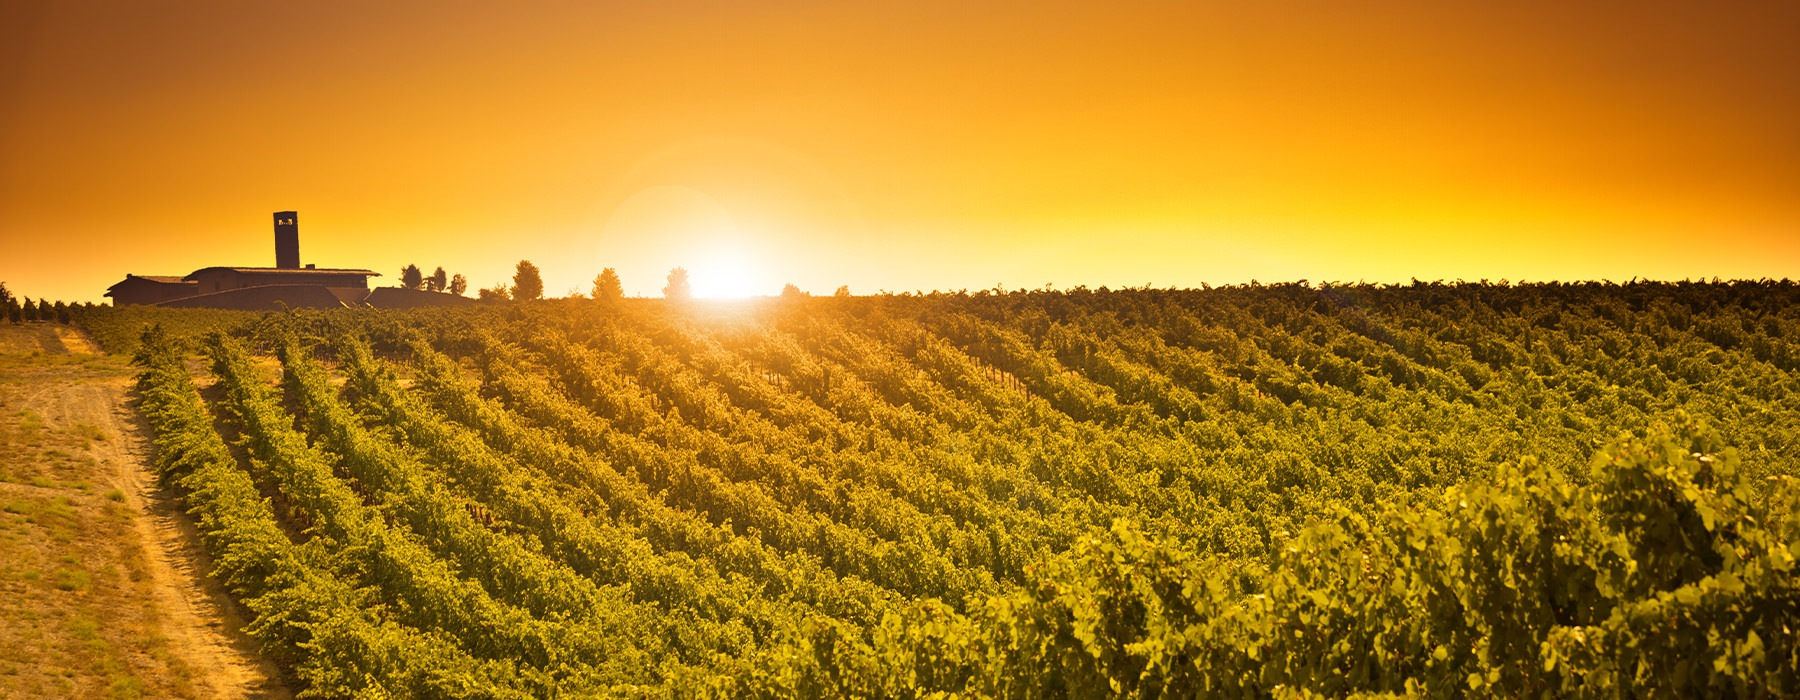 Beautiful sunset over a winery